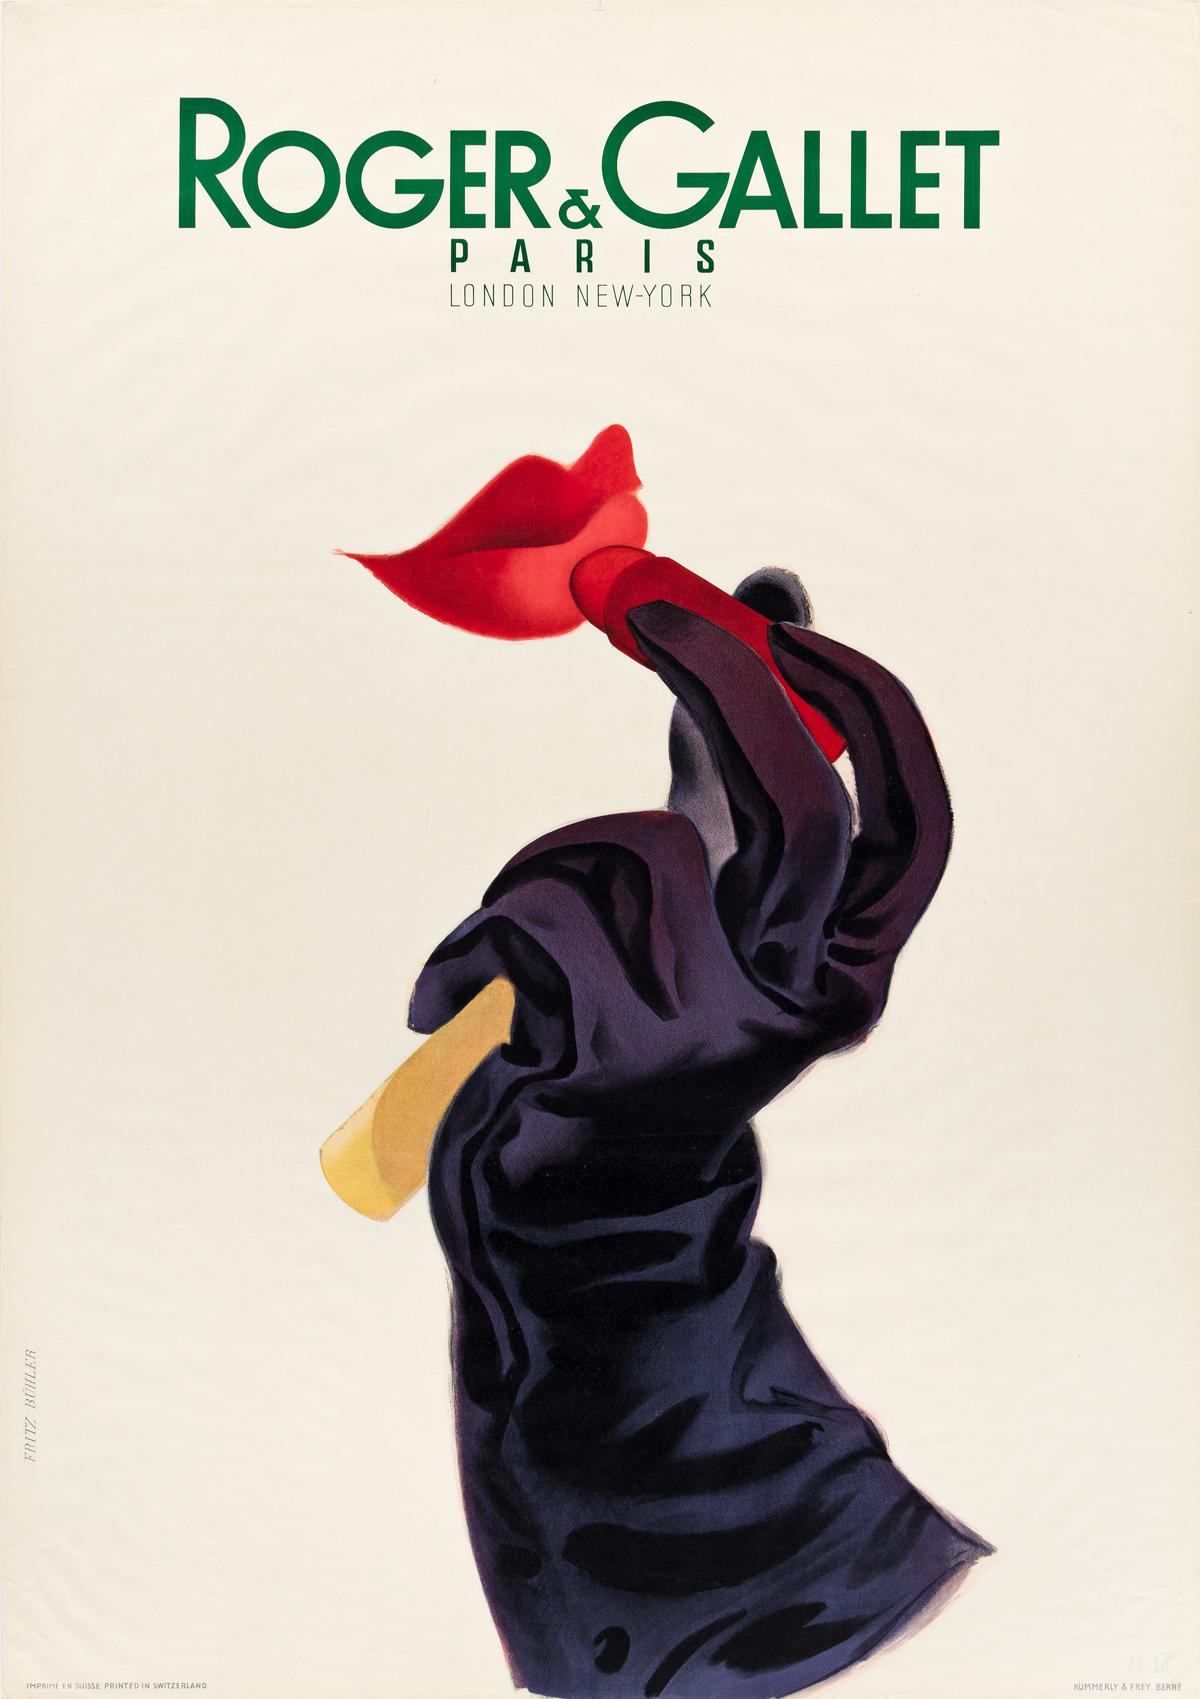 FRITZ BÜHLER (1909-1963).  ROGER & GALLET PARIS. 1947. 50¼x35½ inches, 127½x90 cm. Kümmerly & Frey, Berlin.